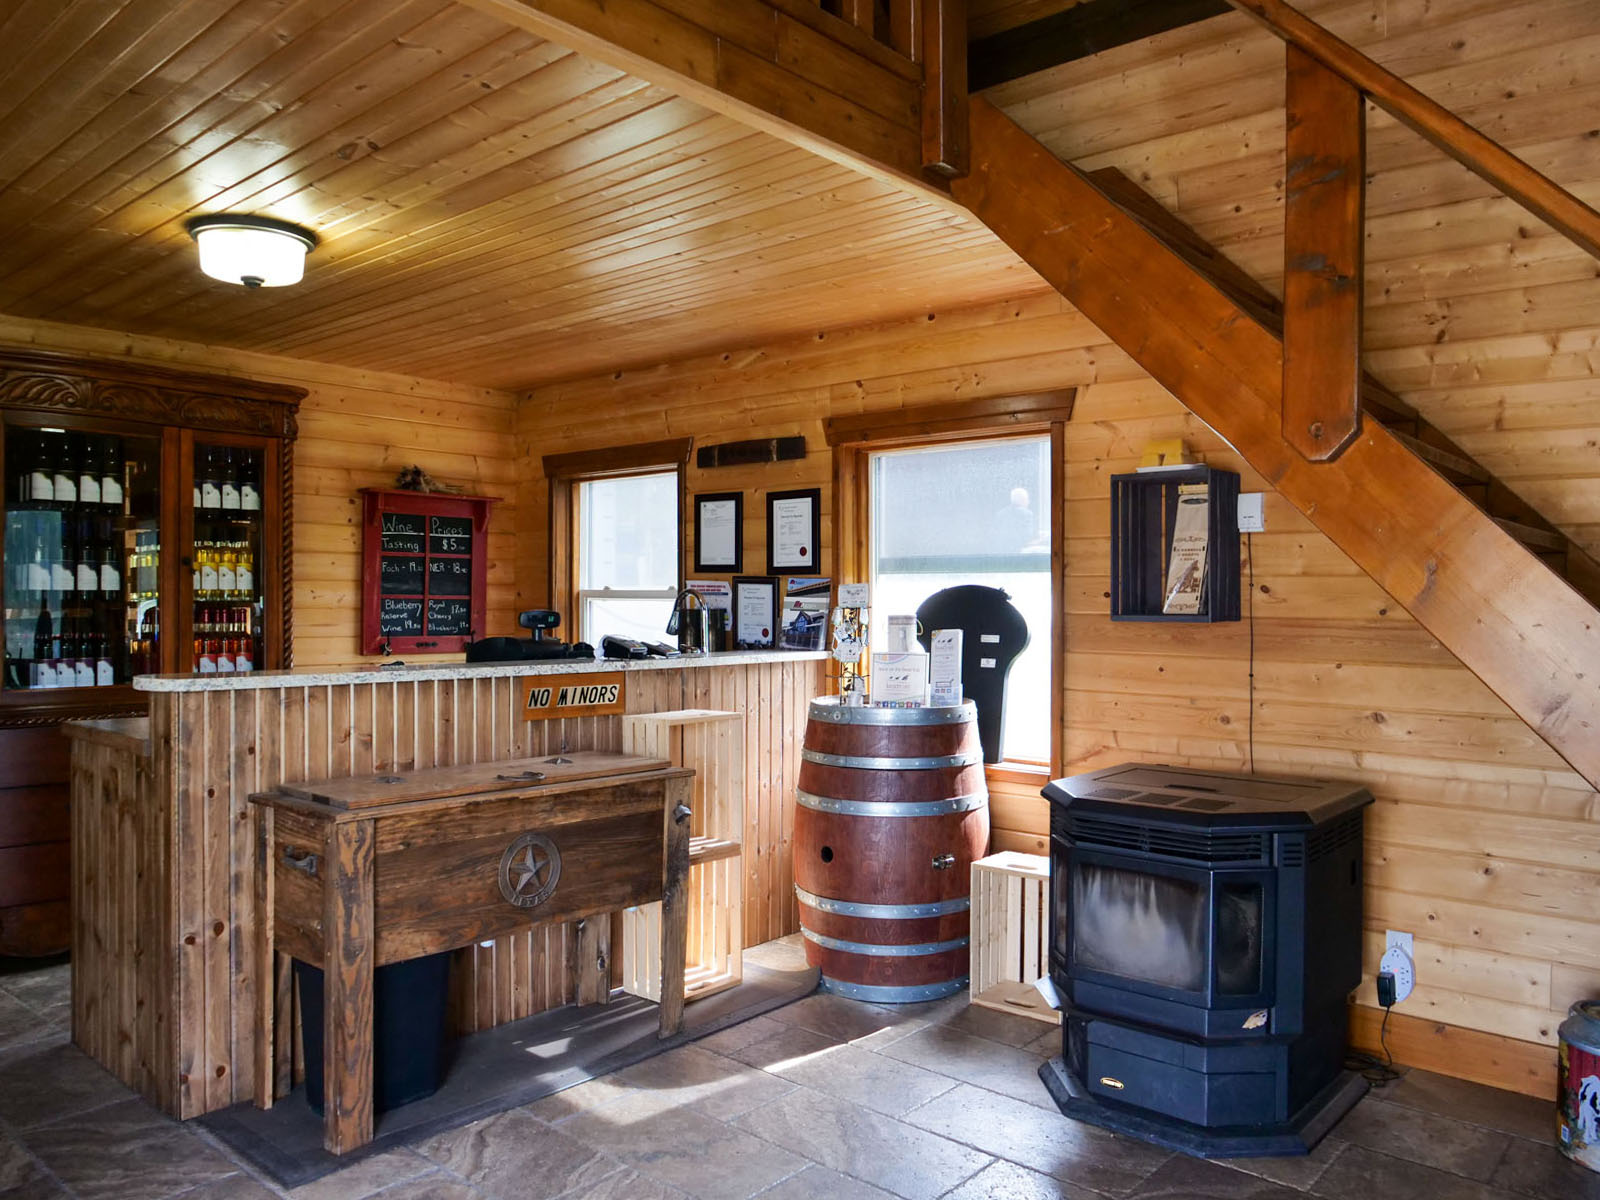 Baccata ridge winery 34